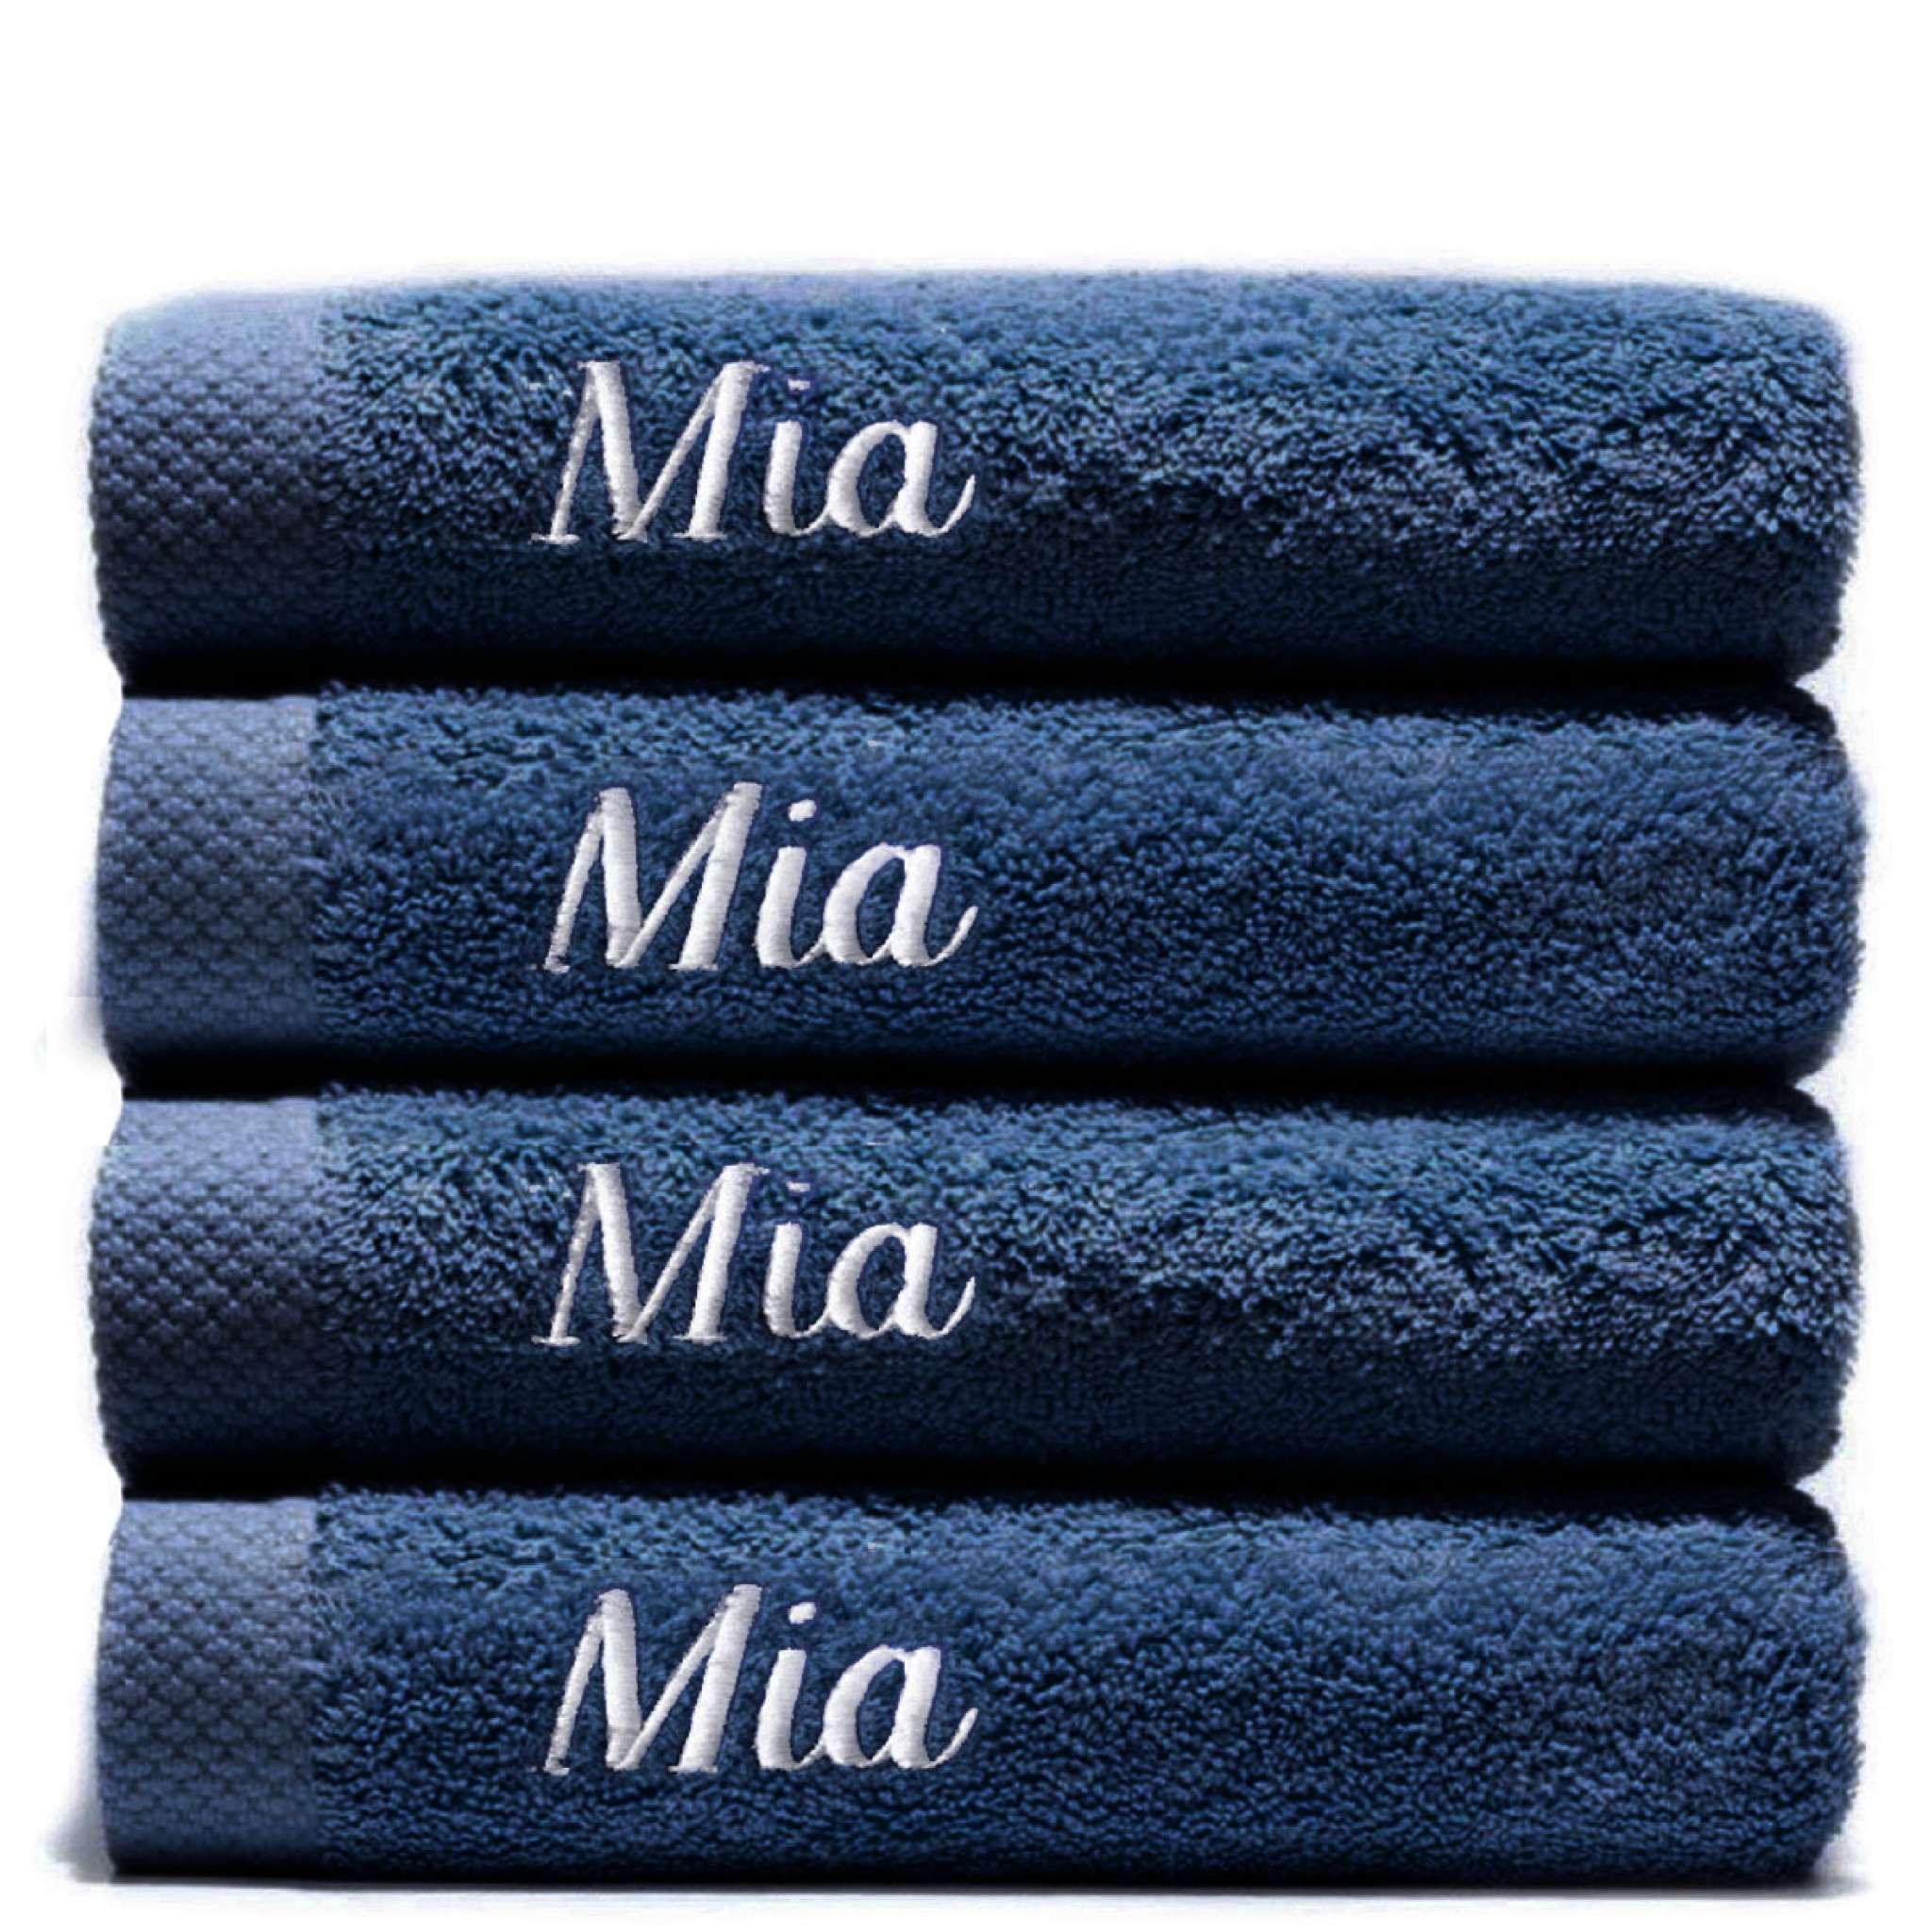 4-pakk Pure exclusive Badehåndkle